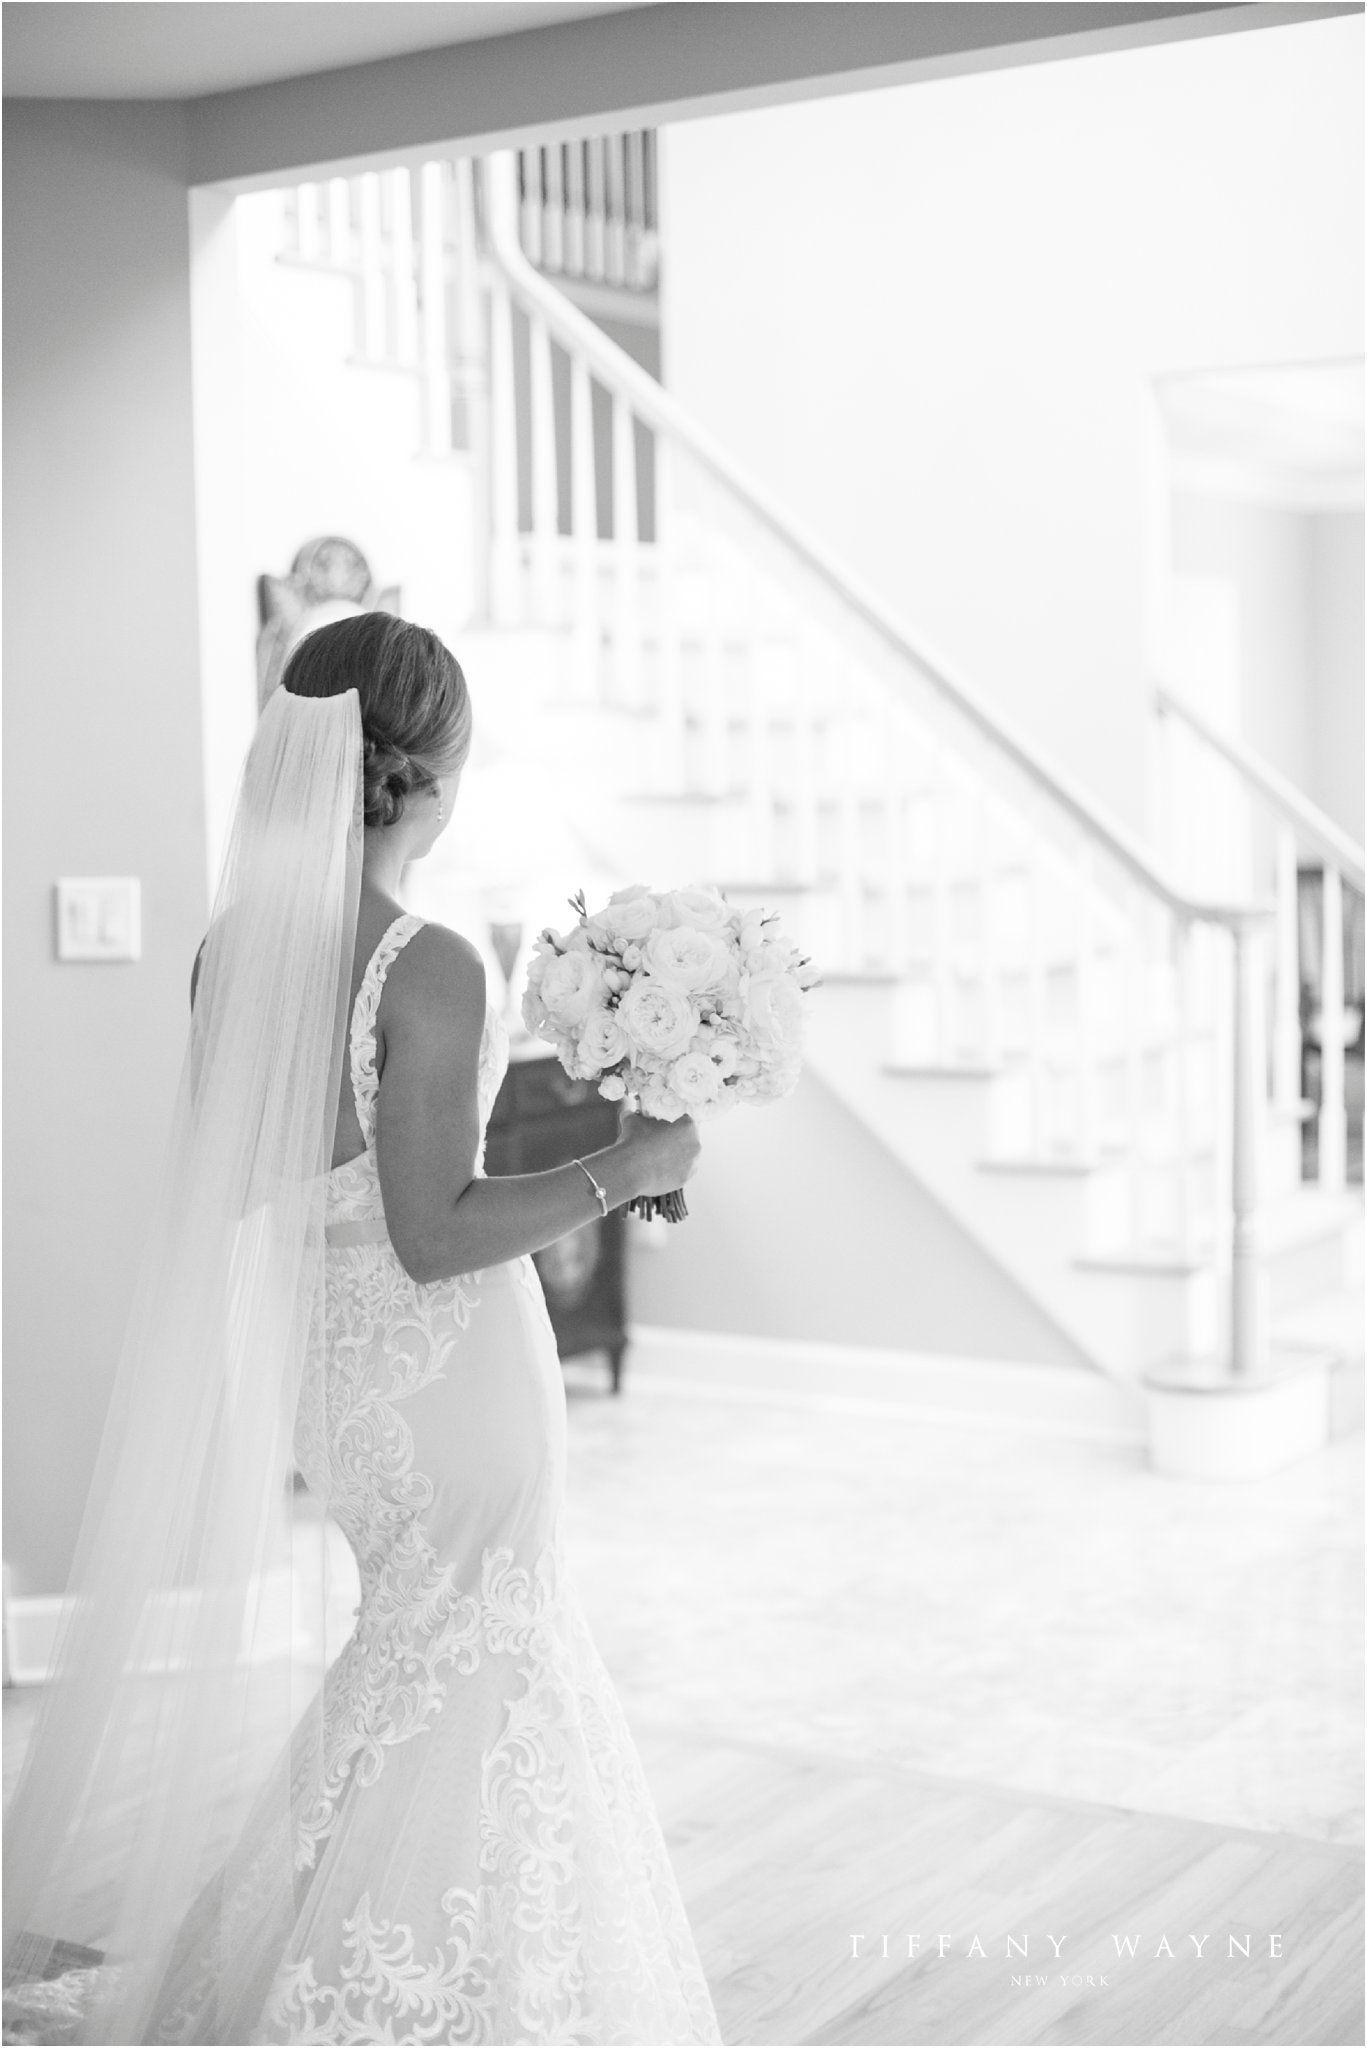 Lace Mermaid Wedding Dress With Straps Long Bride Veil Bride